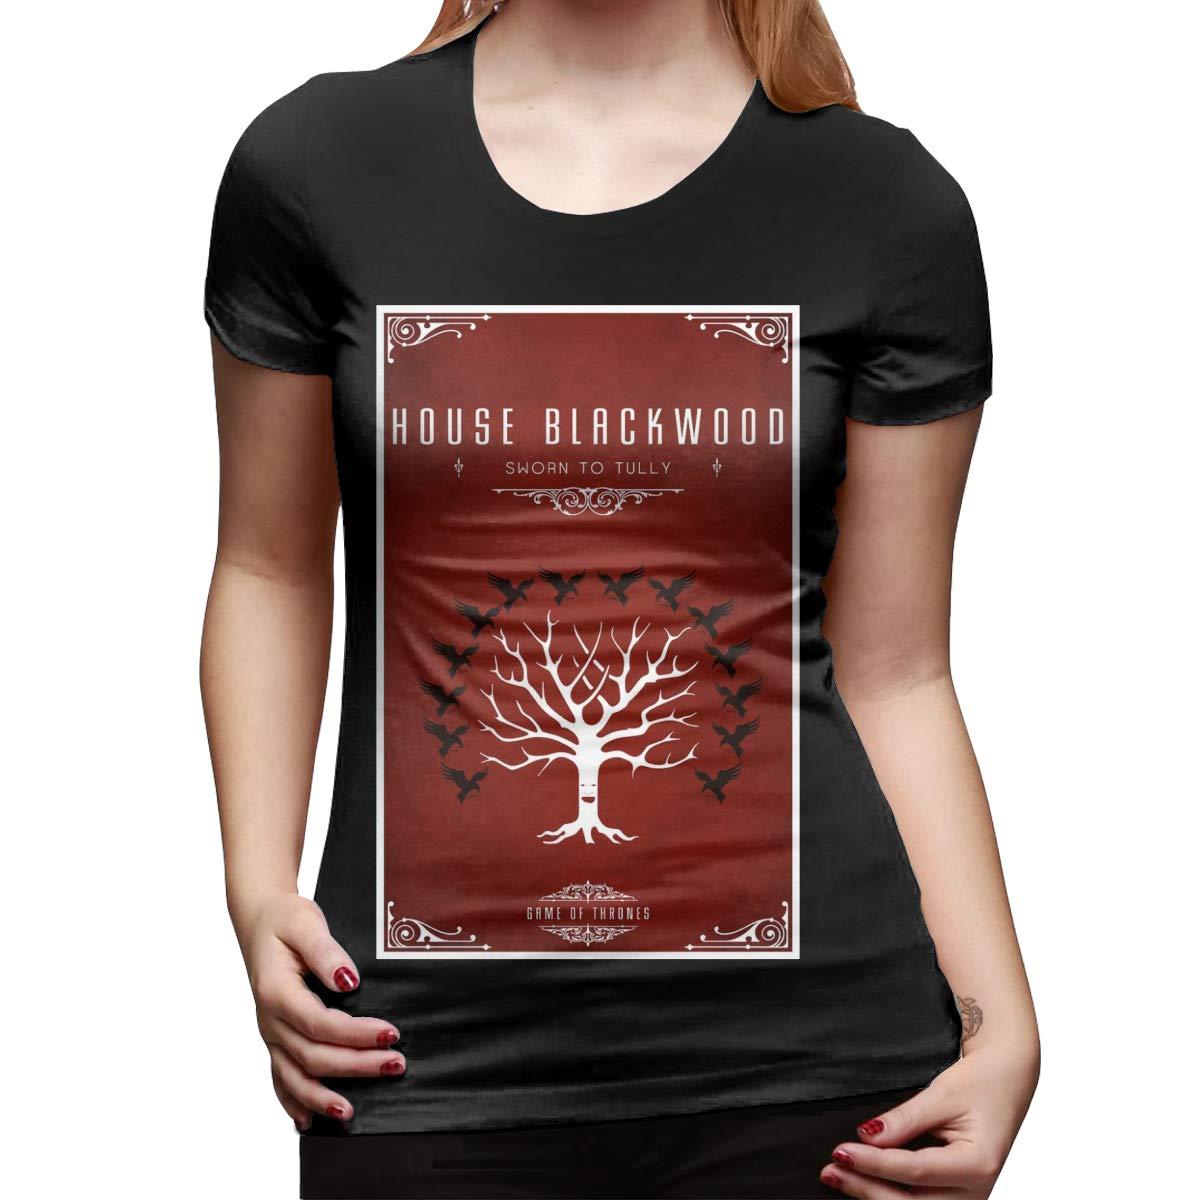 BYSKA Woman Personalized Tops Tees Game of Thrones Short Sleeve Fashion T Shirt Black